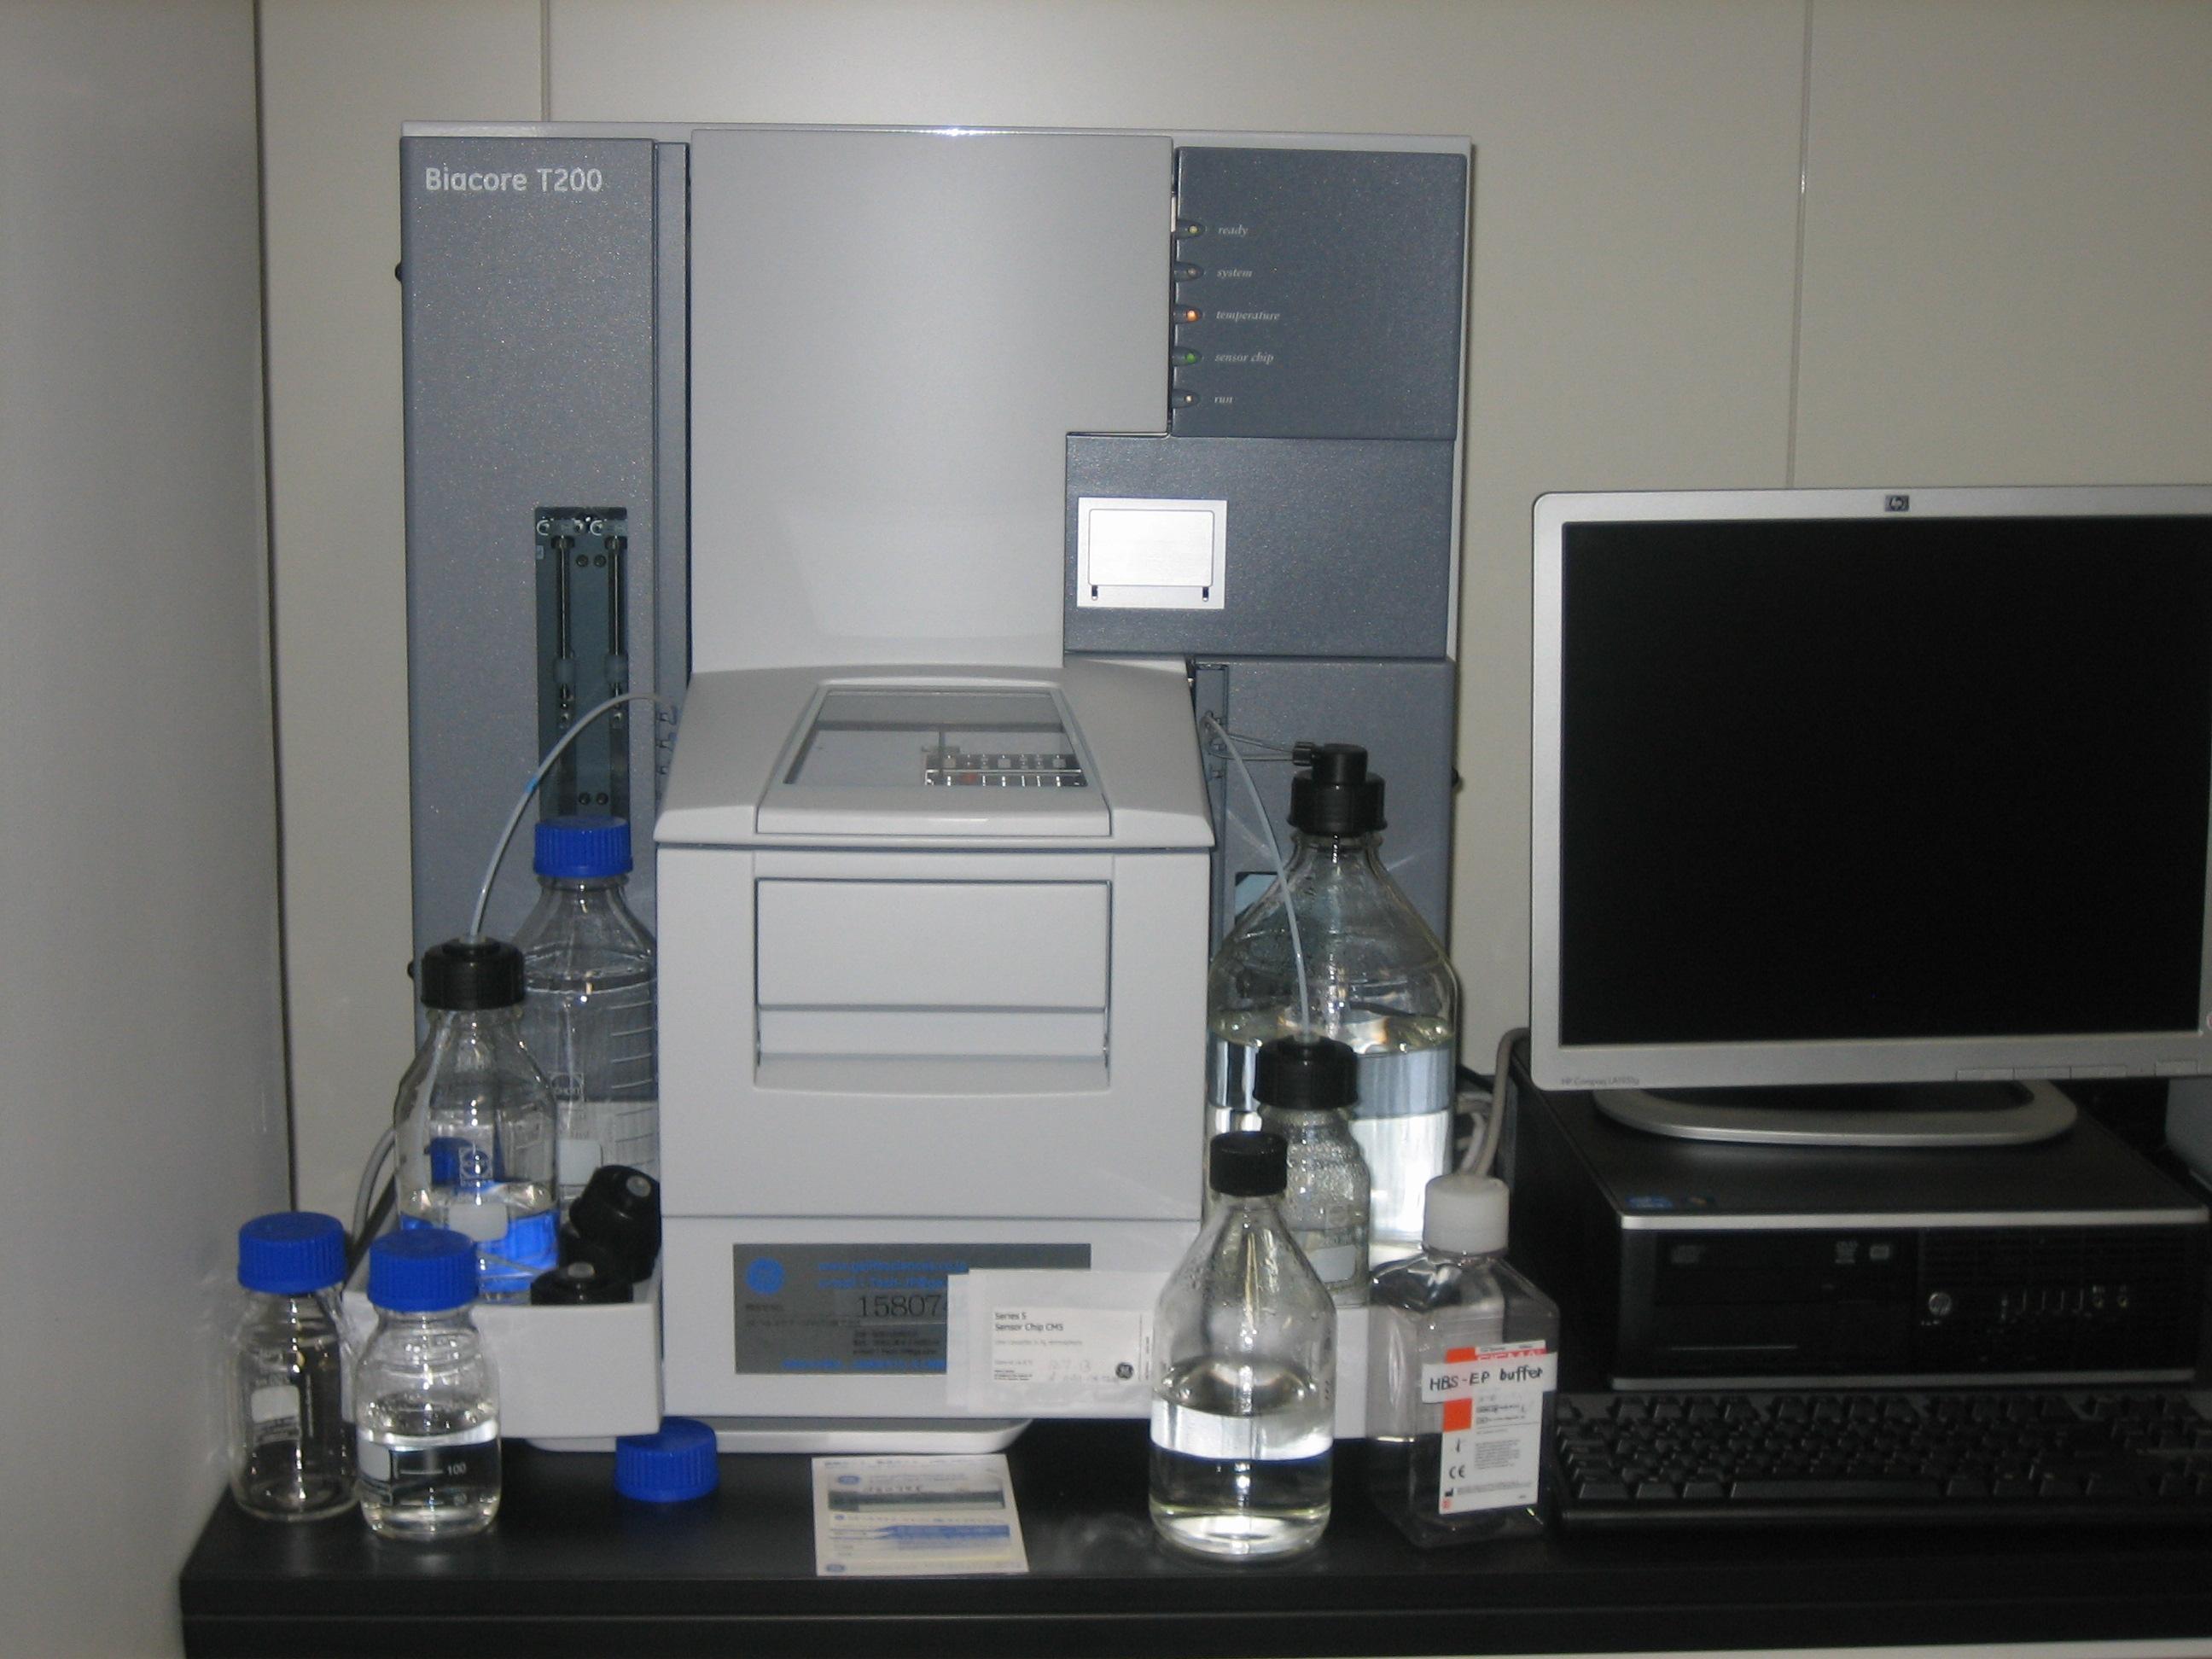 [043] 核酸分子定量解析装置 RNA解析用アレイスキャナー 生体分子間相互作用解析装置(Biacore T200 外) 画像